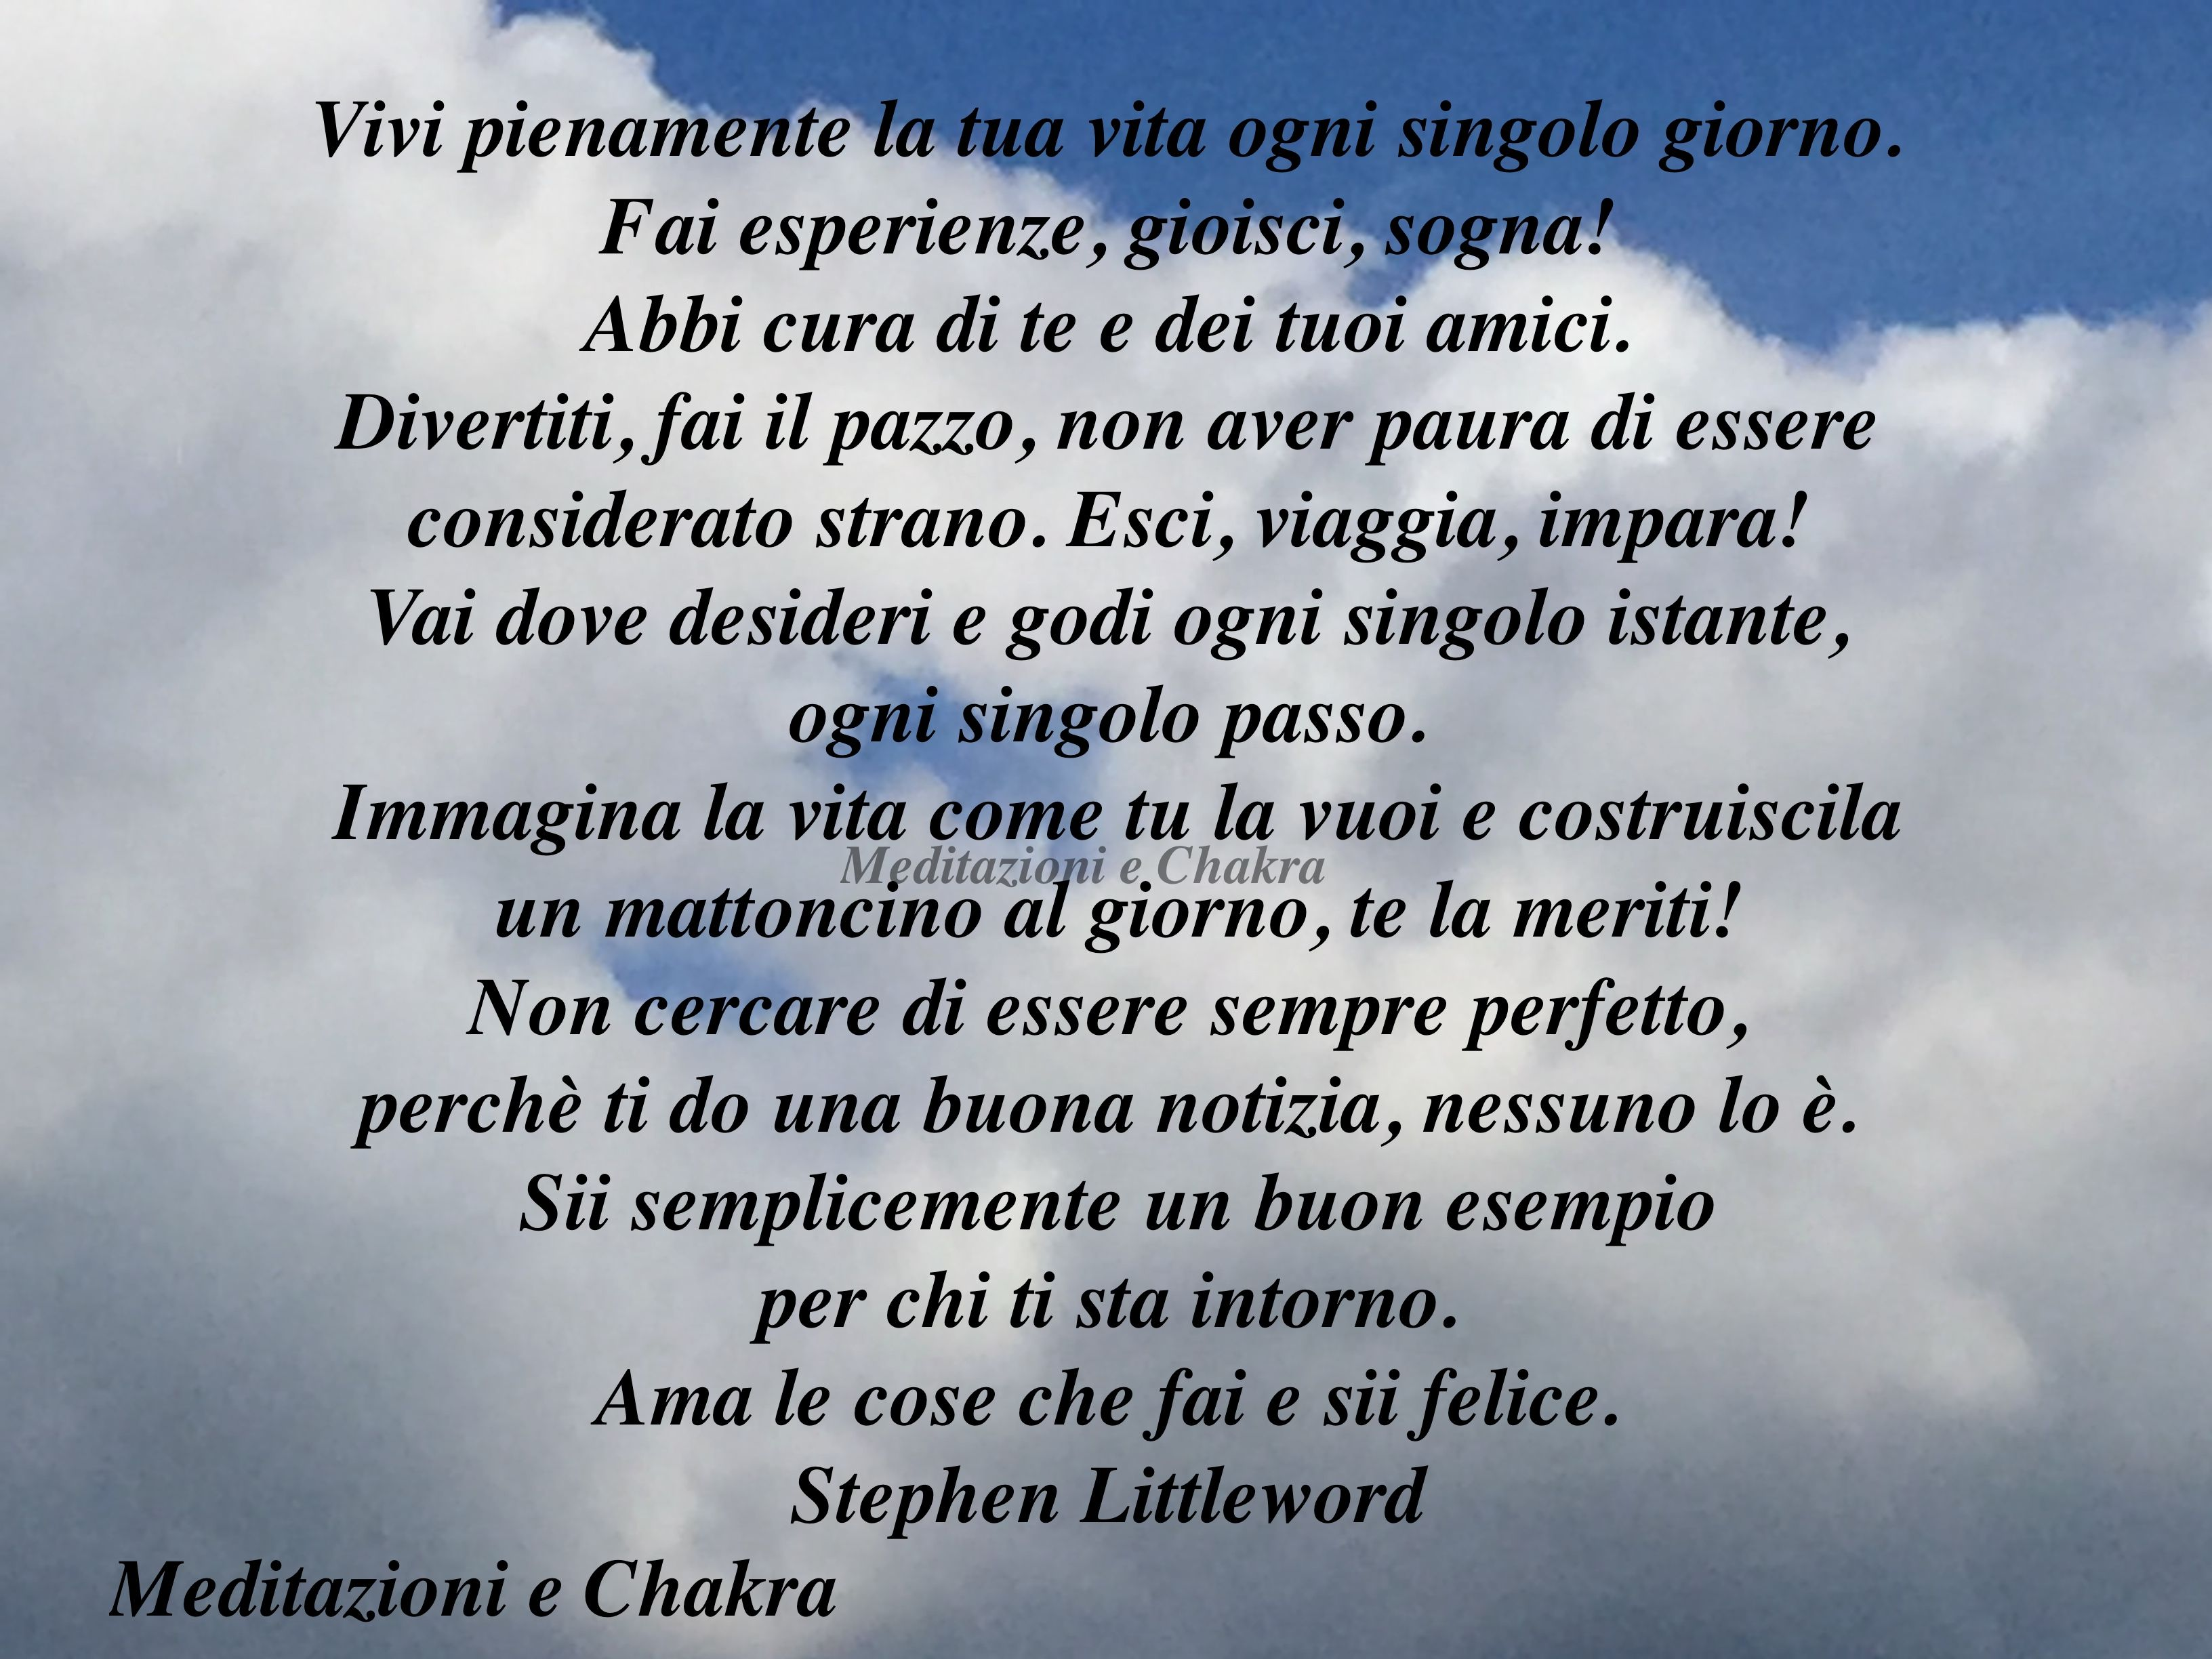 http://www.ilgiardinodeilibri.it/libri/__piccole-cose-stephen-littleword.php?pn=4319